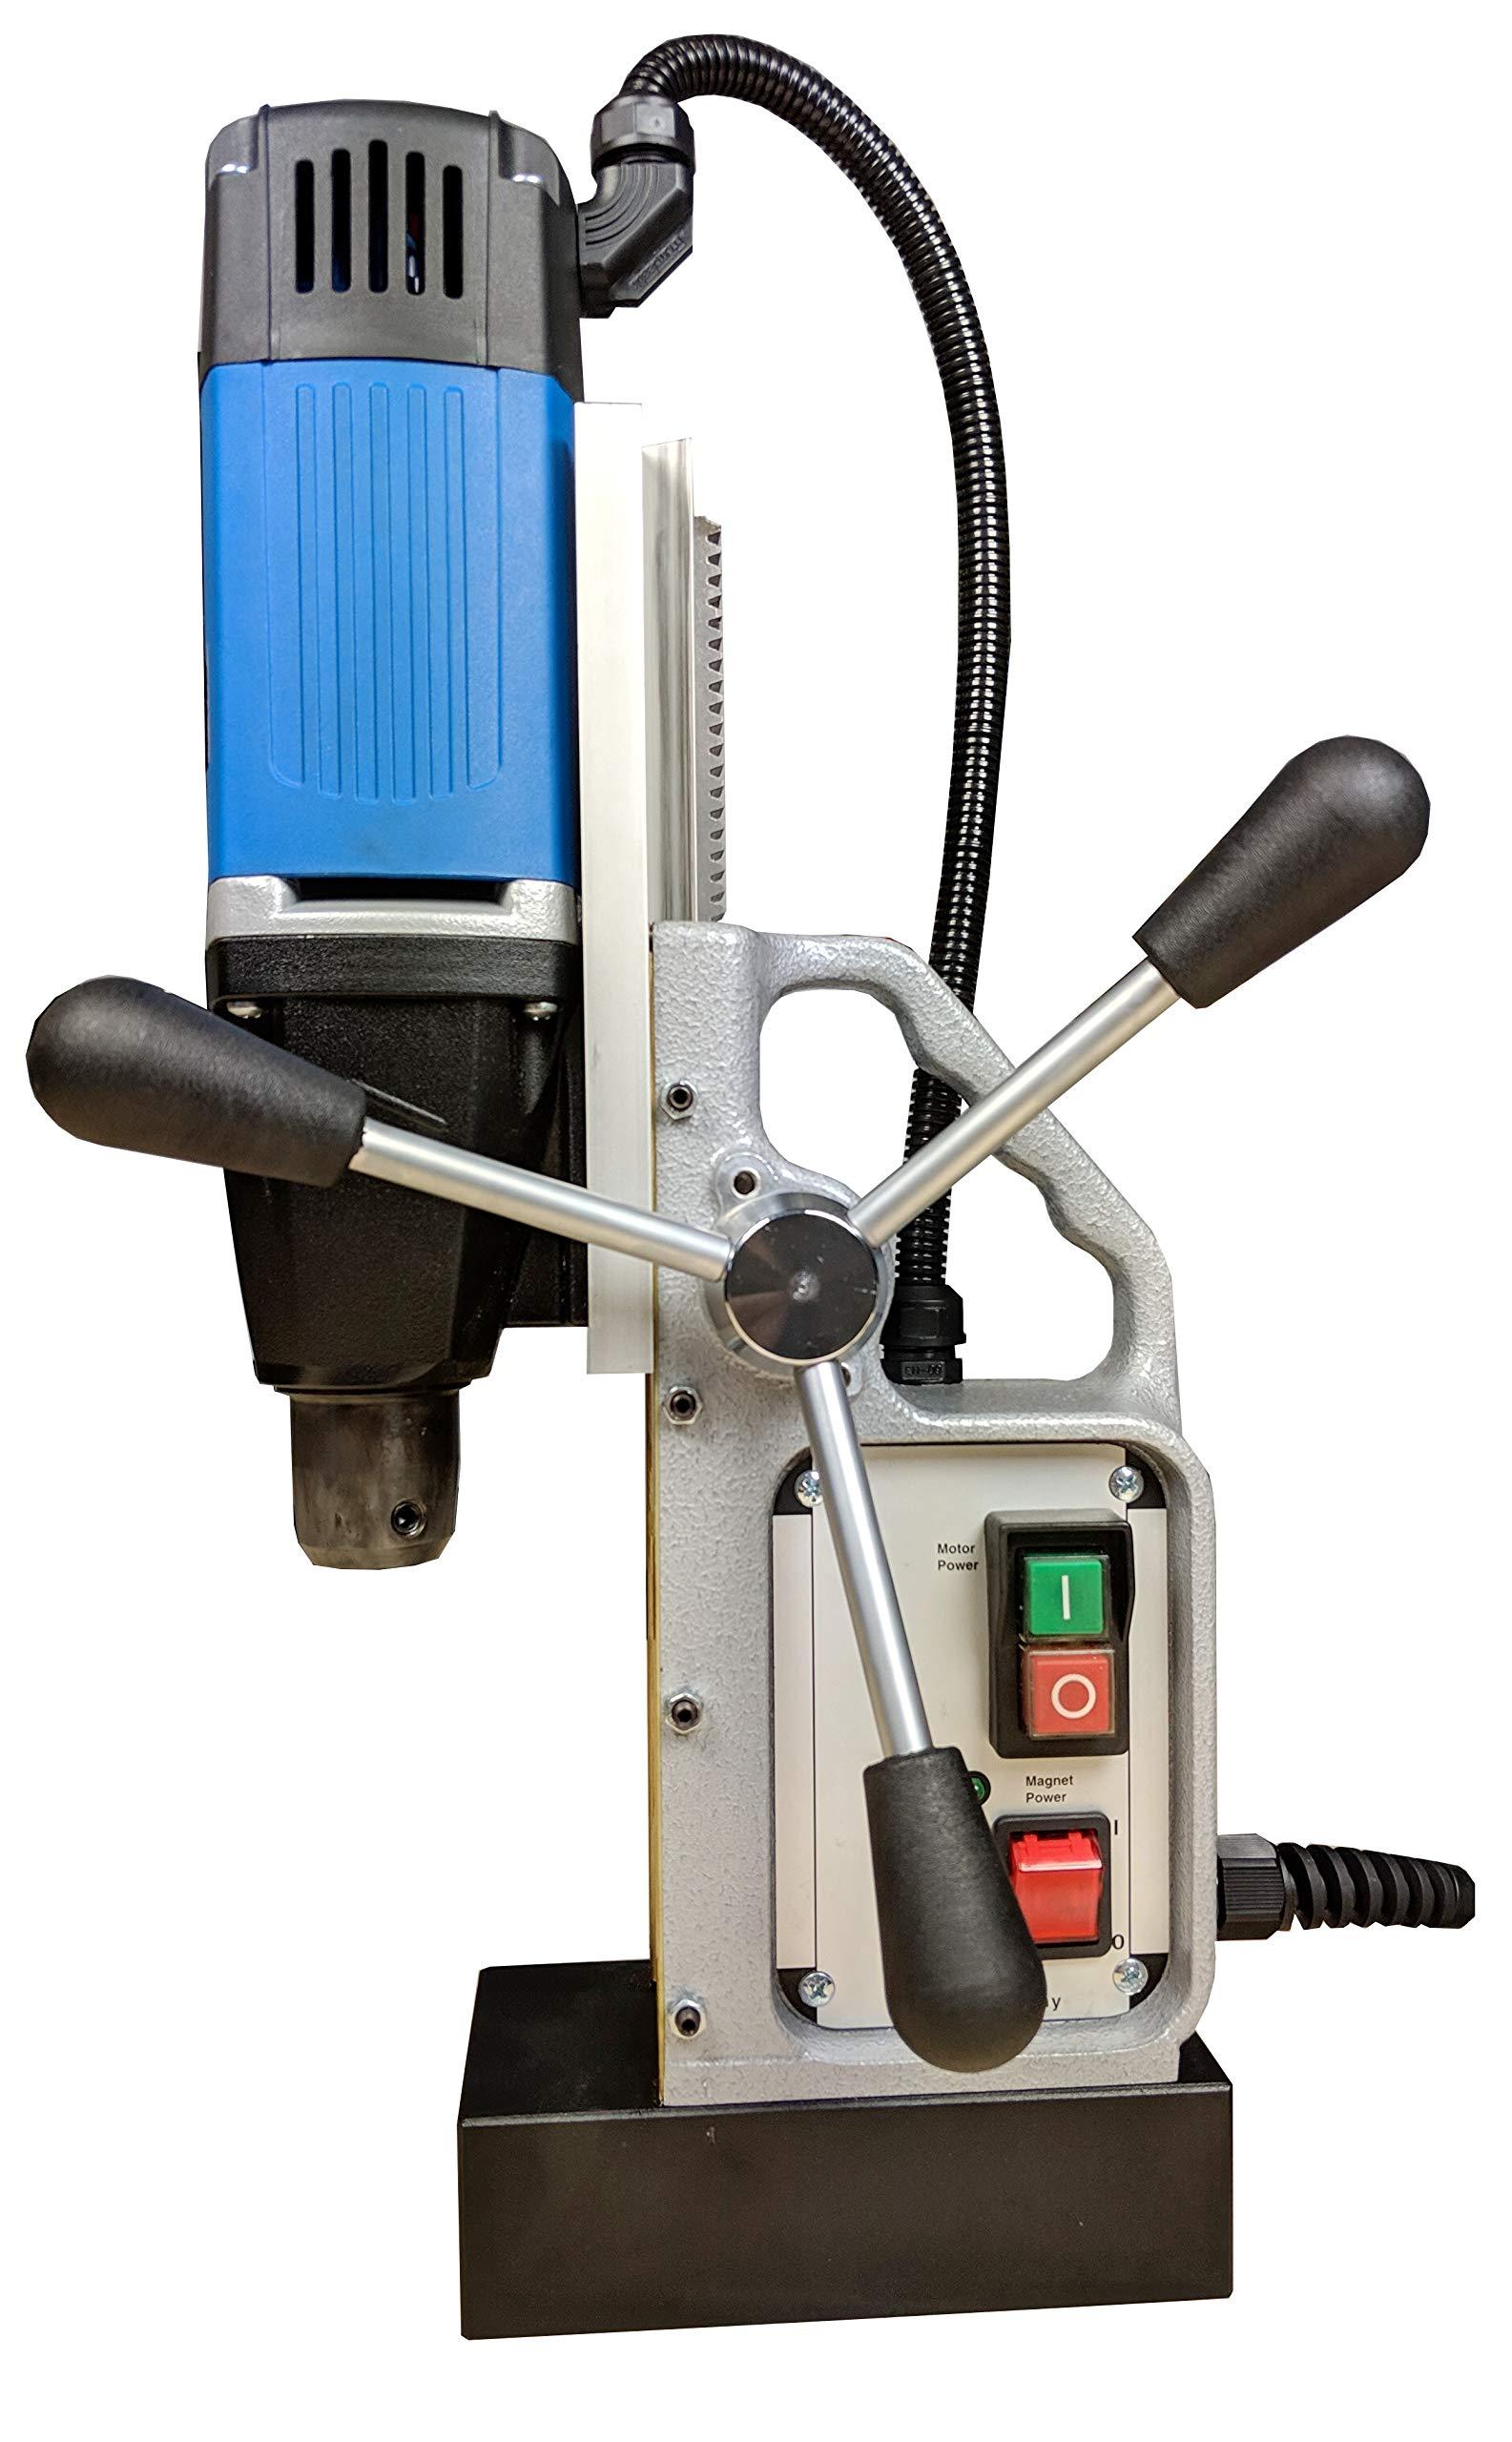 Magnetbohrmaschine-MB30-Kernbohrmaschine-900W-Made-in-Germany-fr-kurze-und-lange-Kernbohrer-bis-30mm-inkl-Direktaufnahme-19mm-Weldon